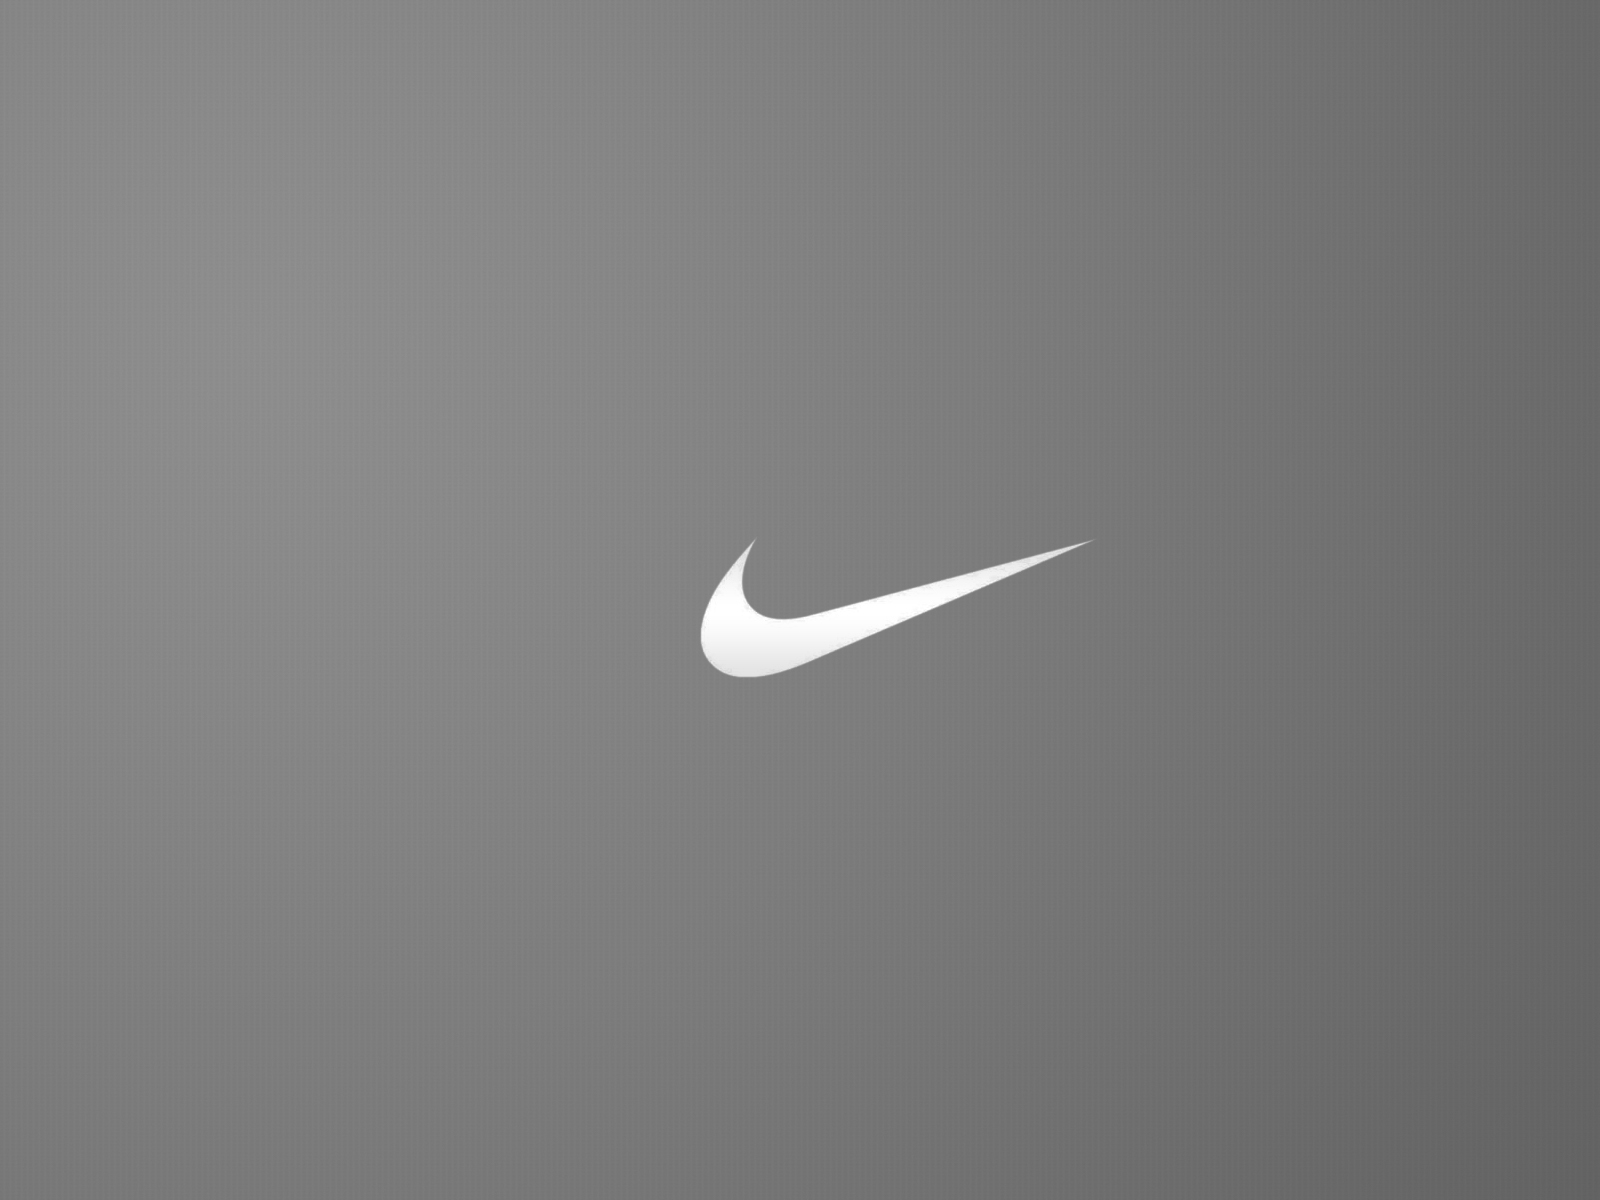 Nike Brand Logo Minimal HD Wallpapers Desktop Wallpapers 1600x1200